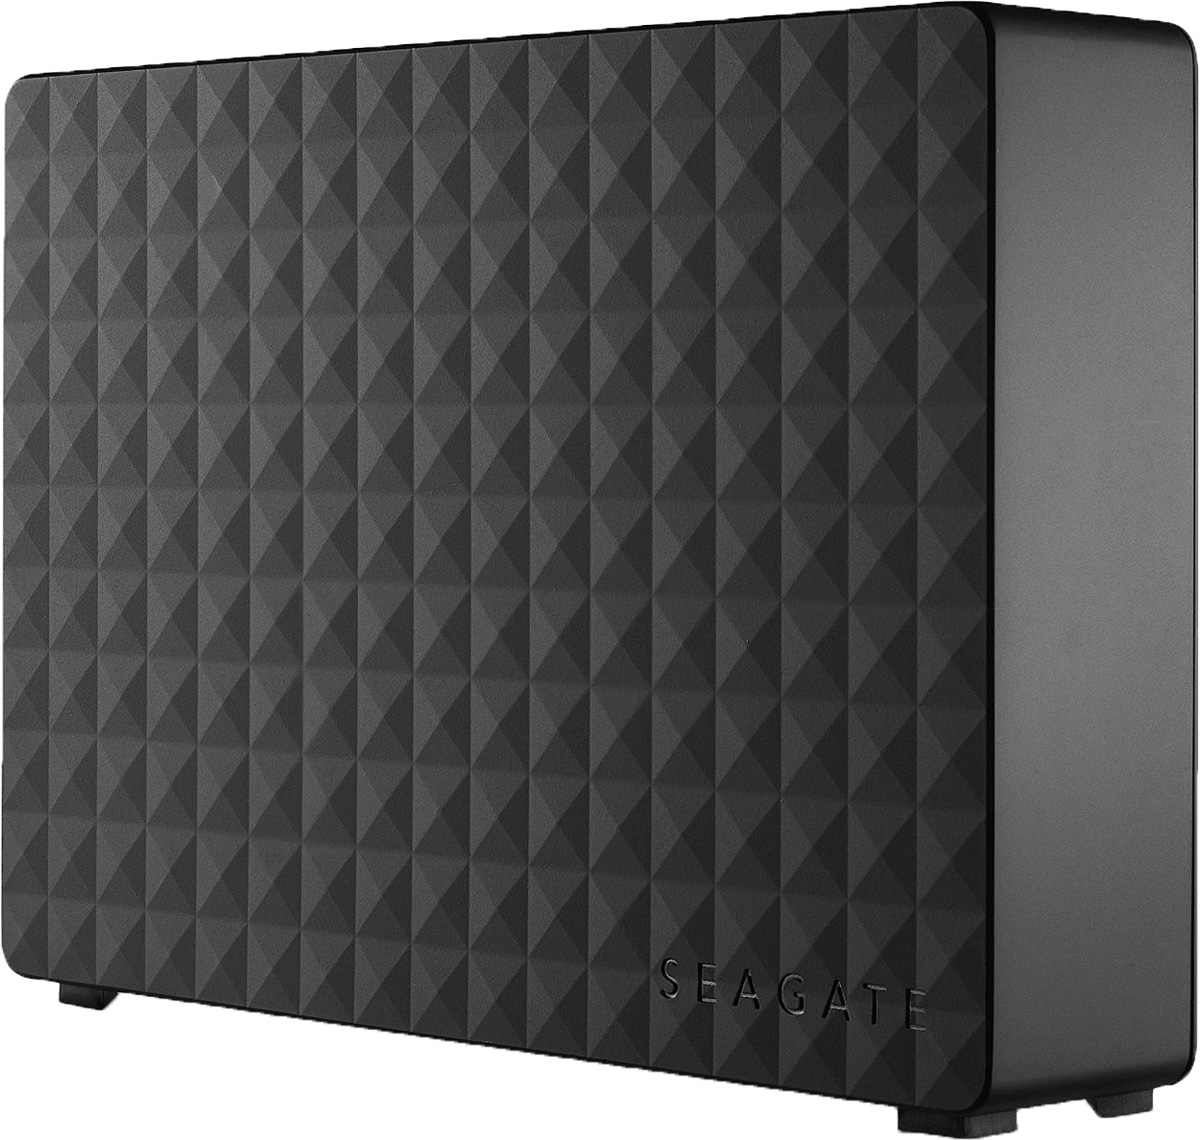 Seagate Expansion Desk 4TB USB 3.0 внешний жесткий диск (STEB4000200) внешний жесткий диск lacie 9000304 silver